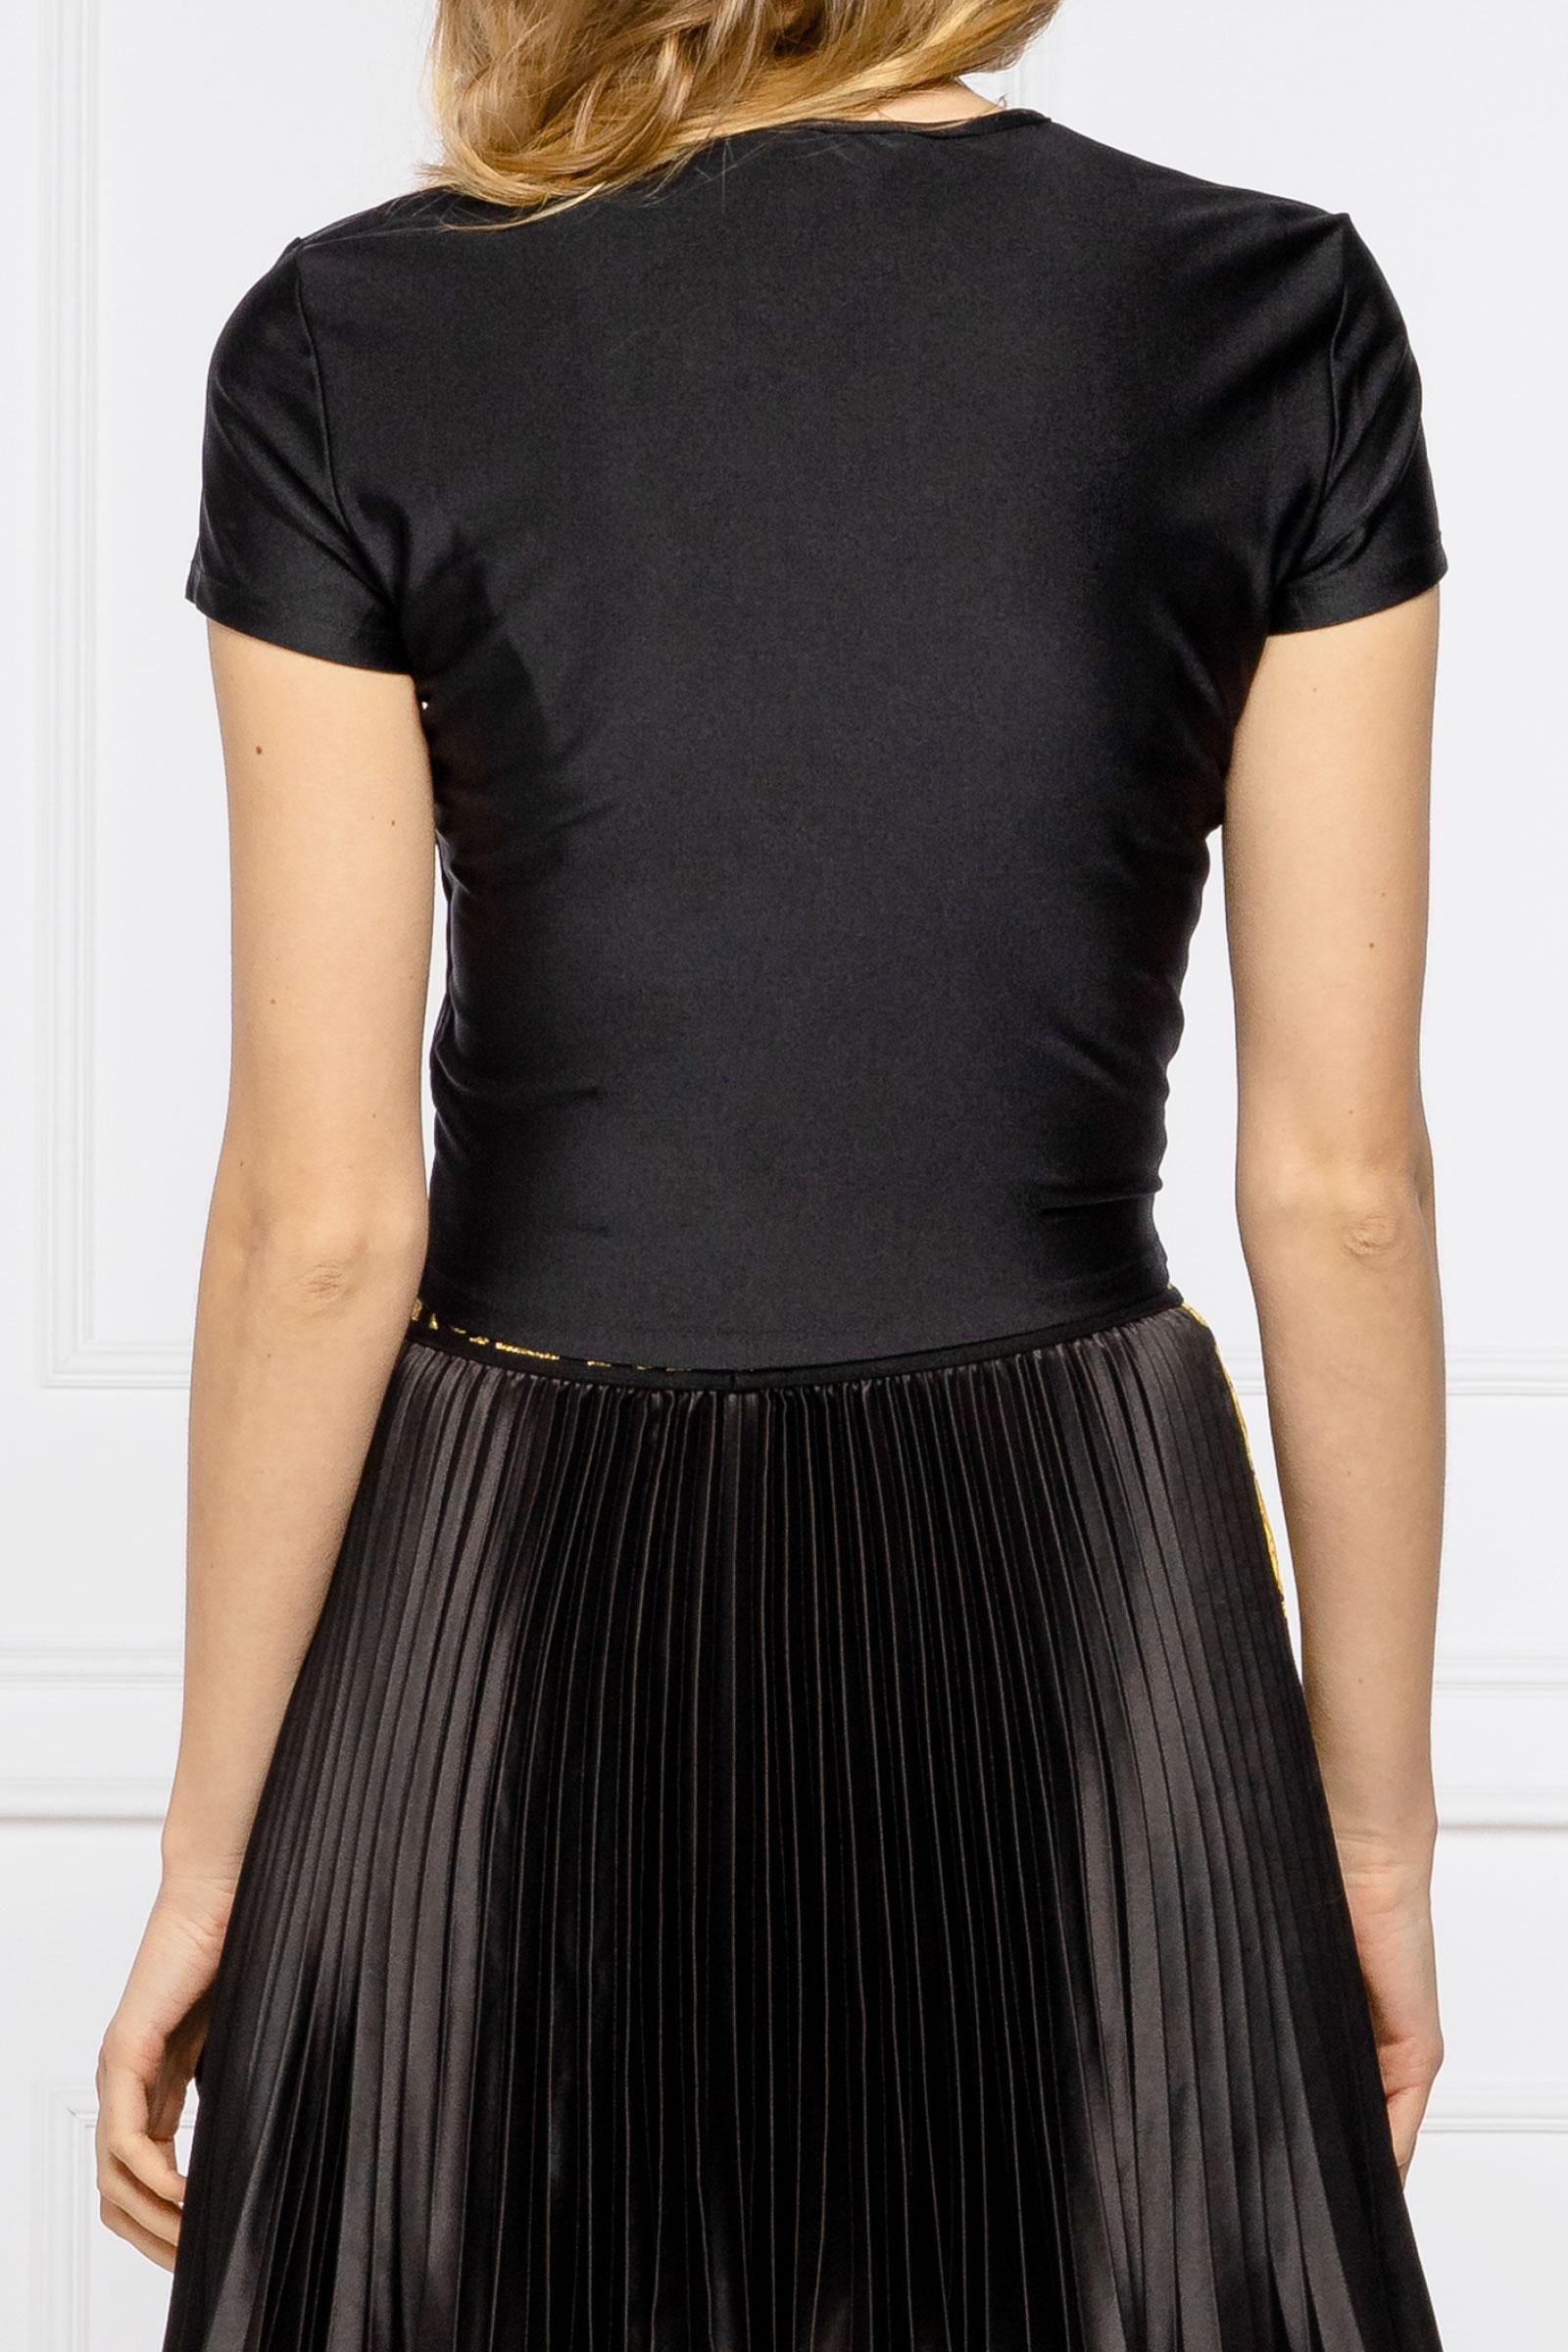 VERSACE JEANS COUTURE Women's T-Shirt VERSACE JEANS COUTURE   T-Shirt   B2HWA70304745899